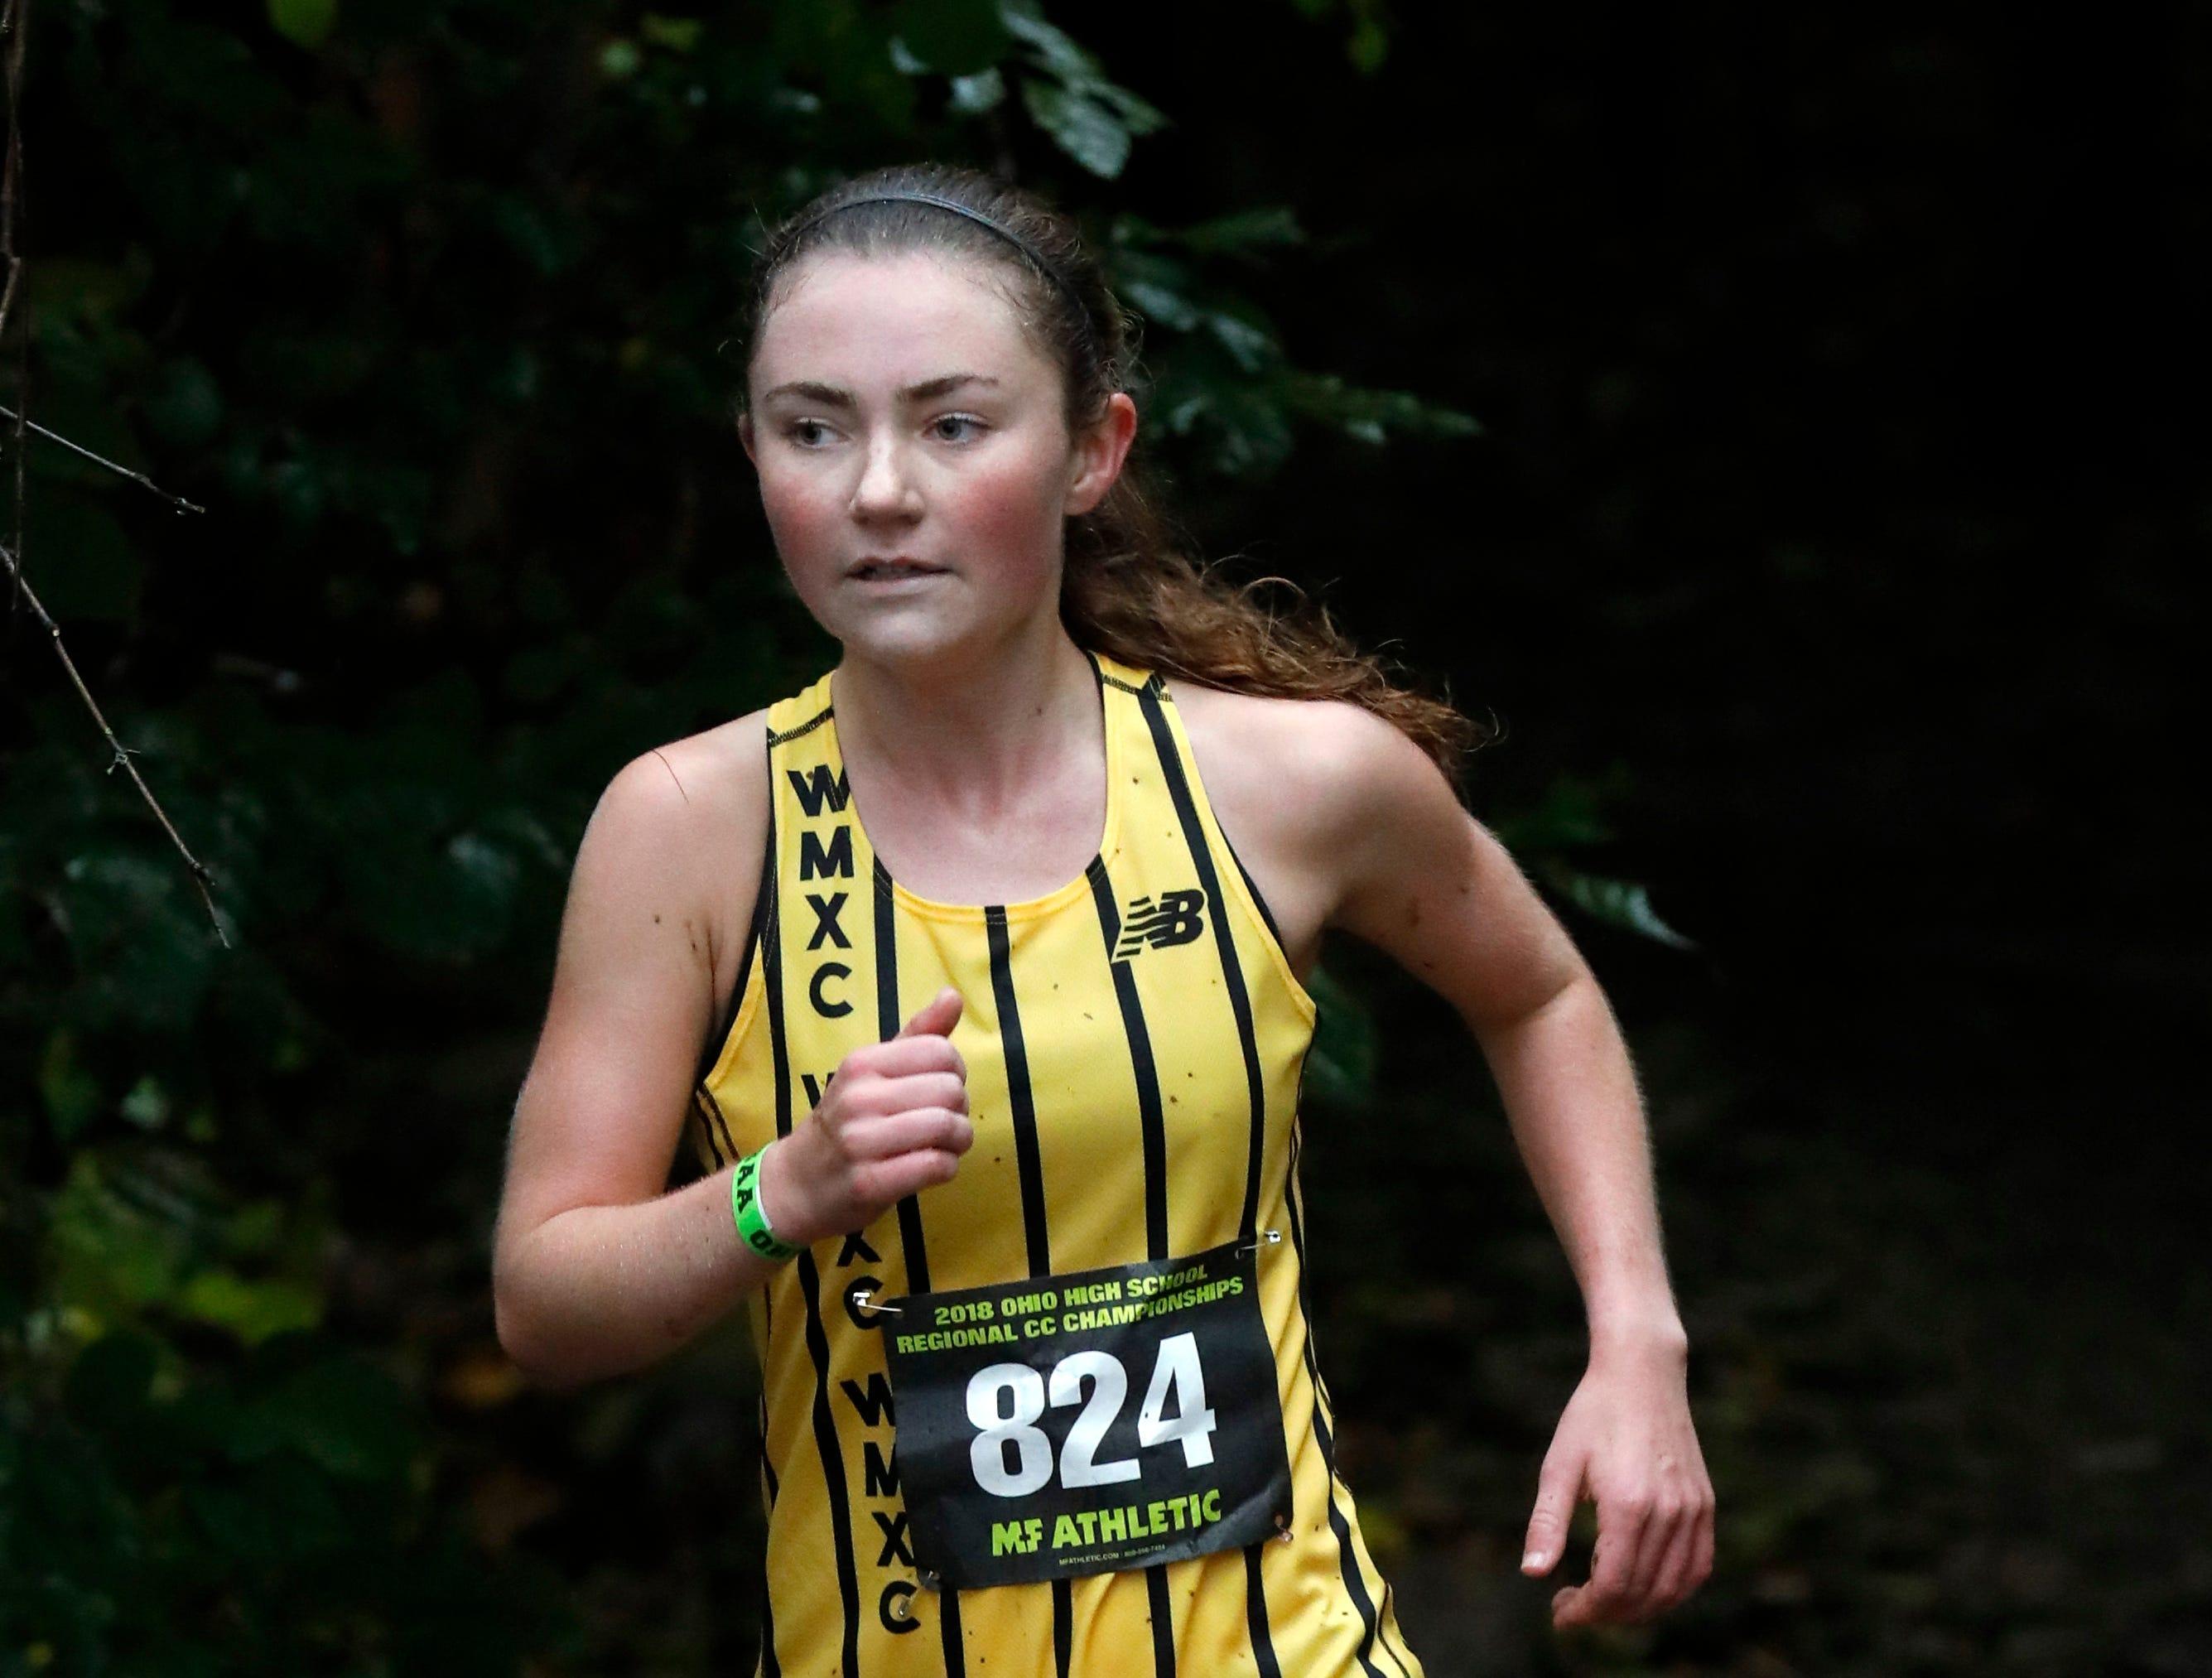 Watkins Memorial's Andrea Kuhn runs in the Regional Cross Country meet Saturday at Pickeringtion North High School.